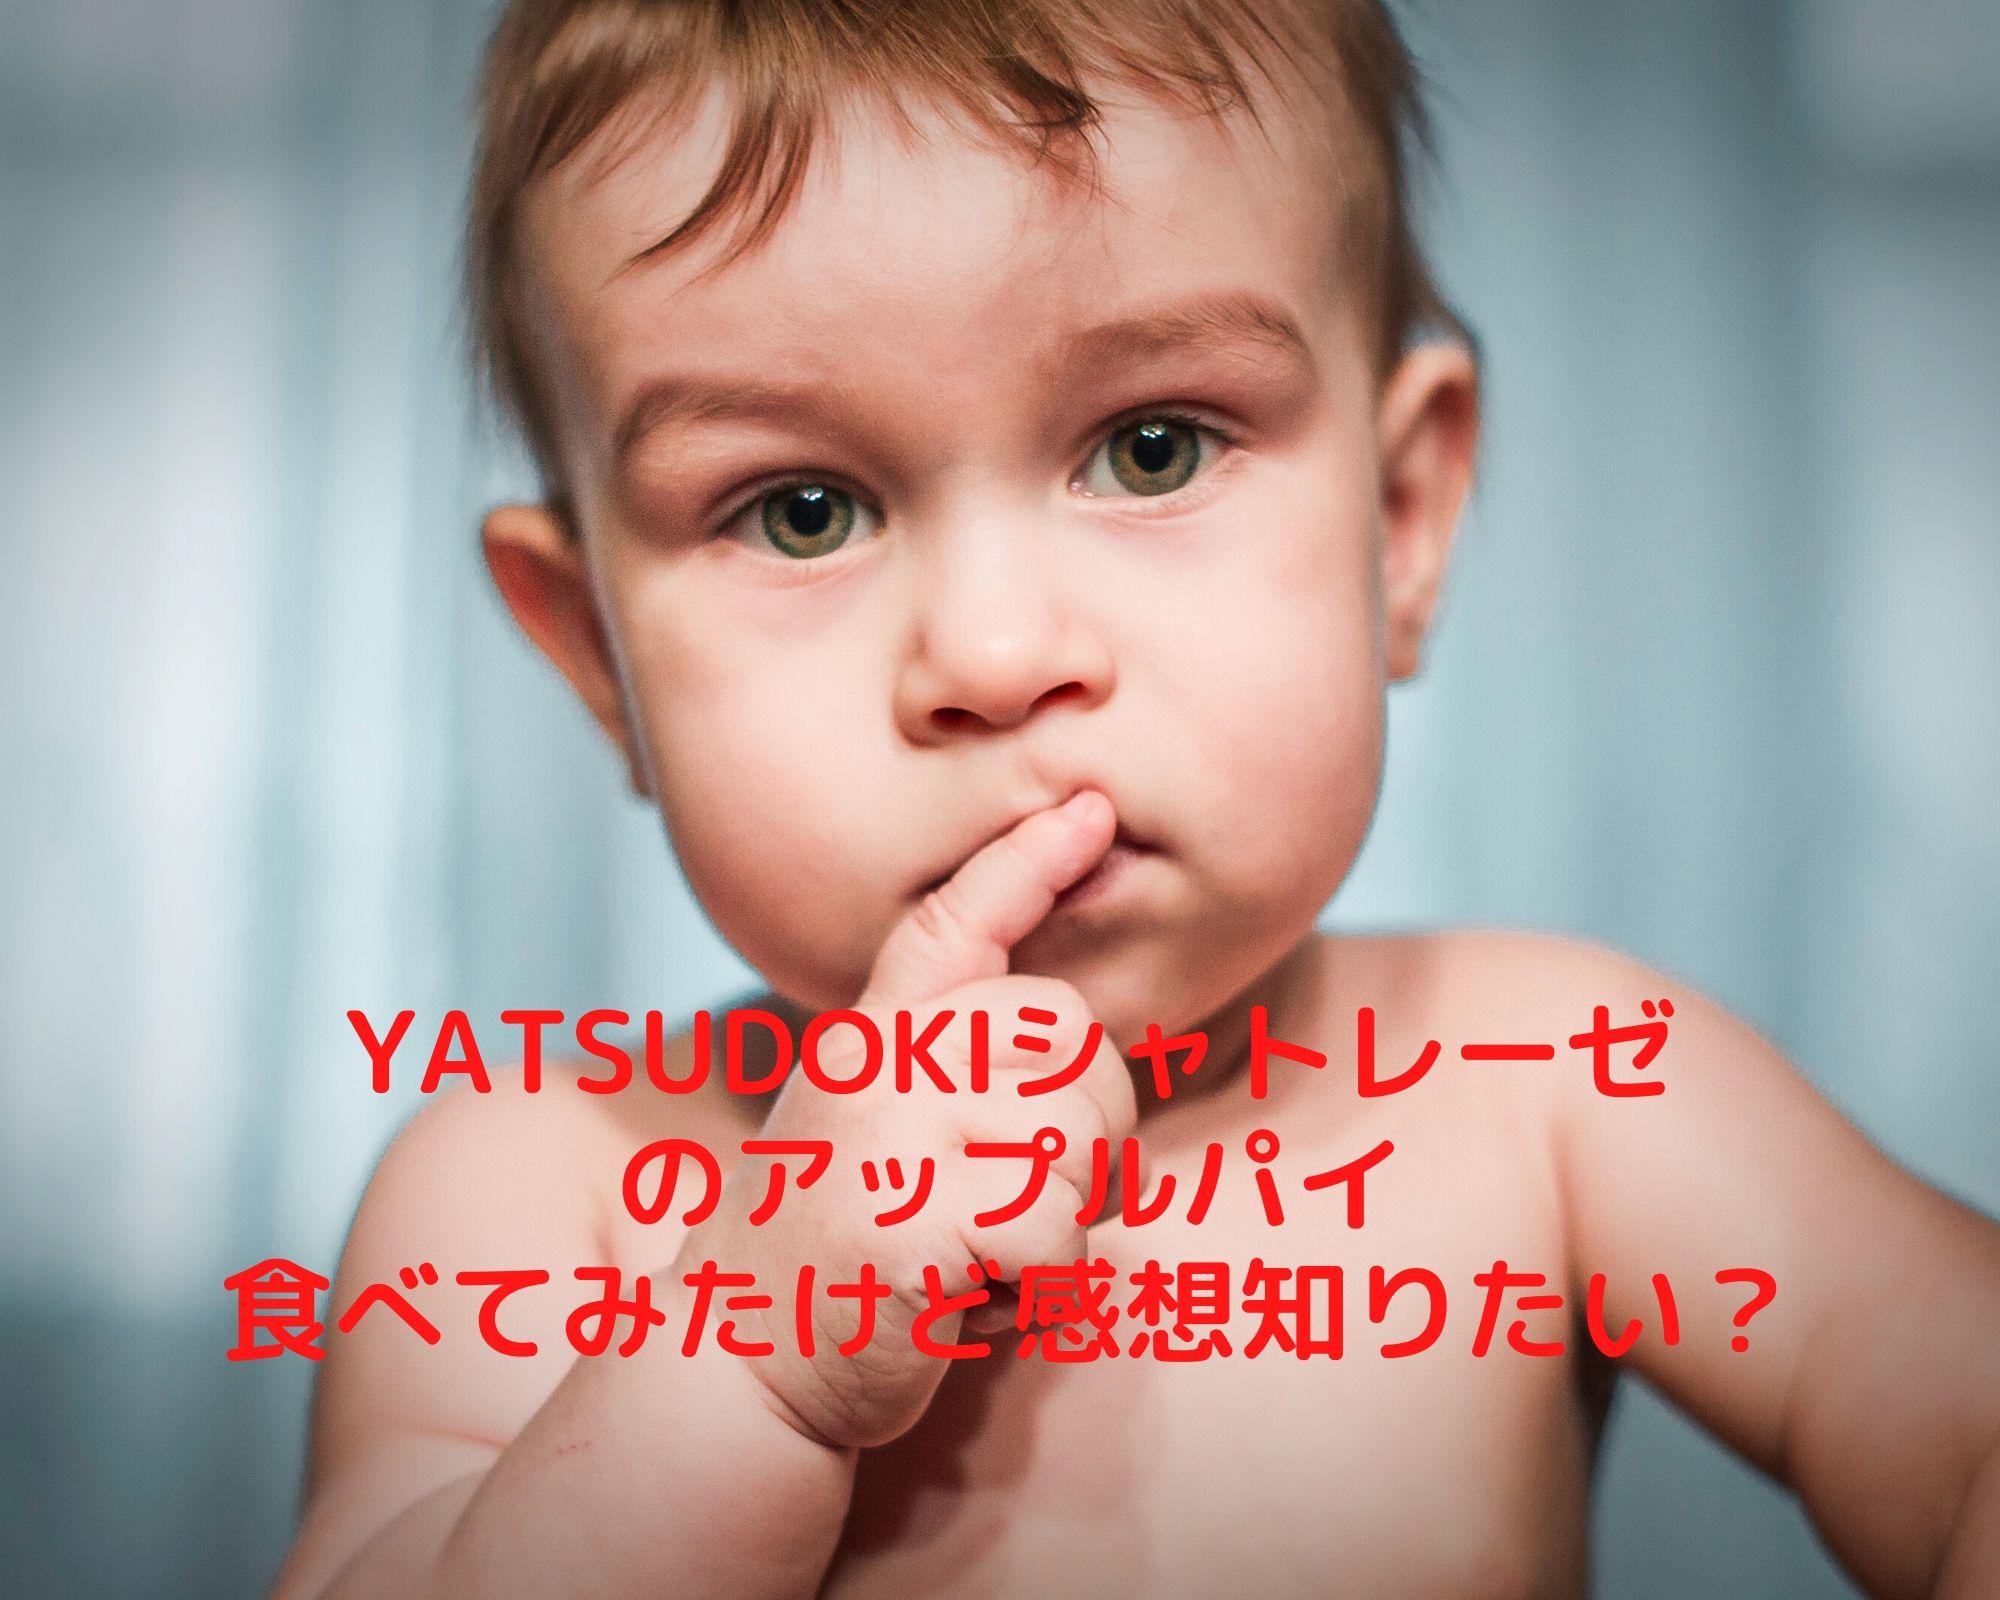 YATSUDOKIシャトレーゼアップルパイ